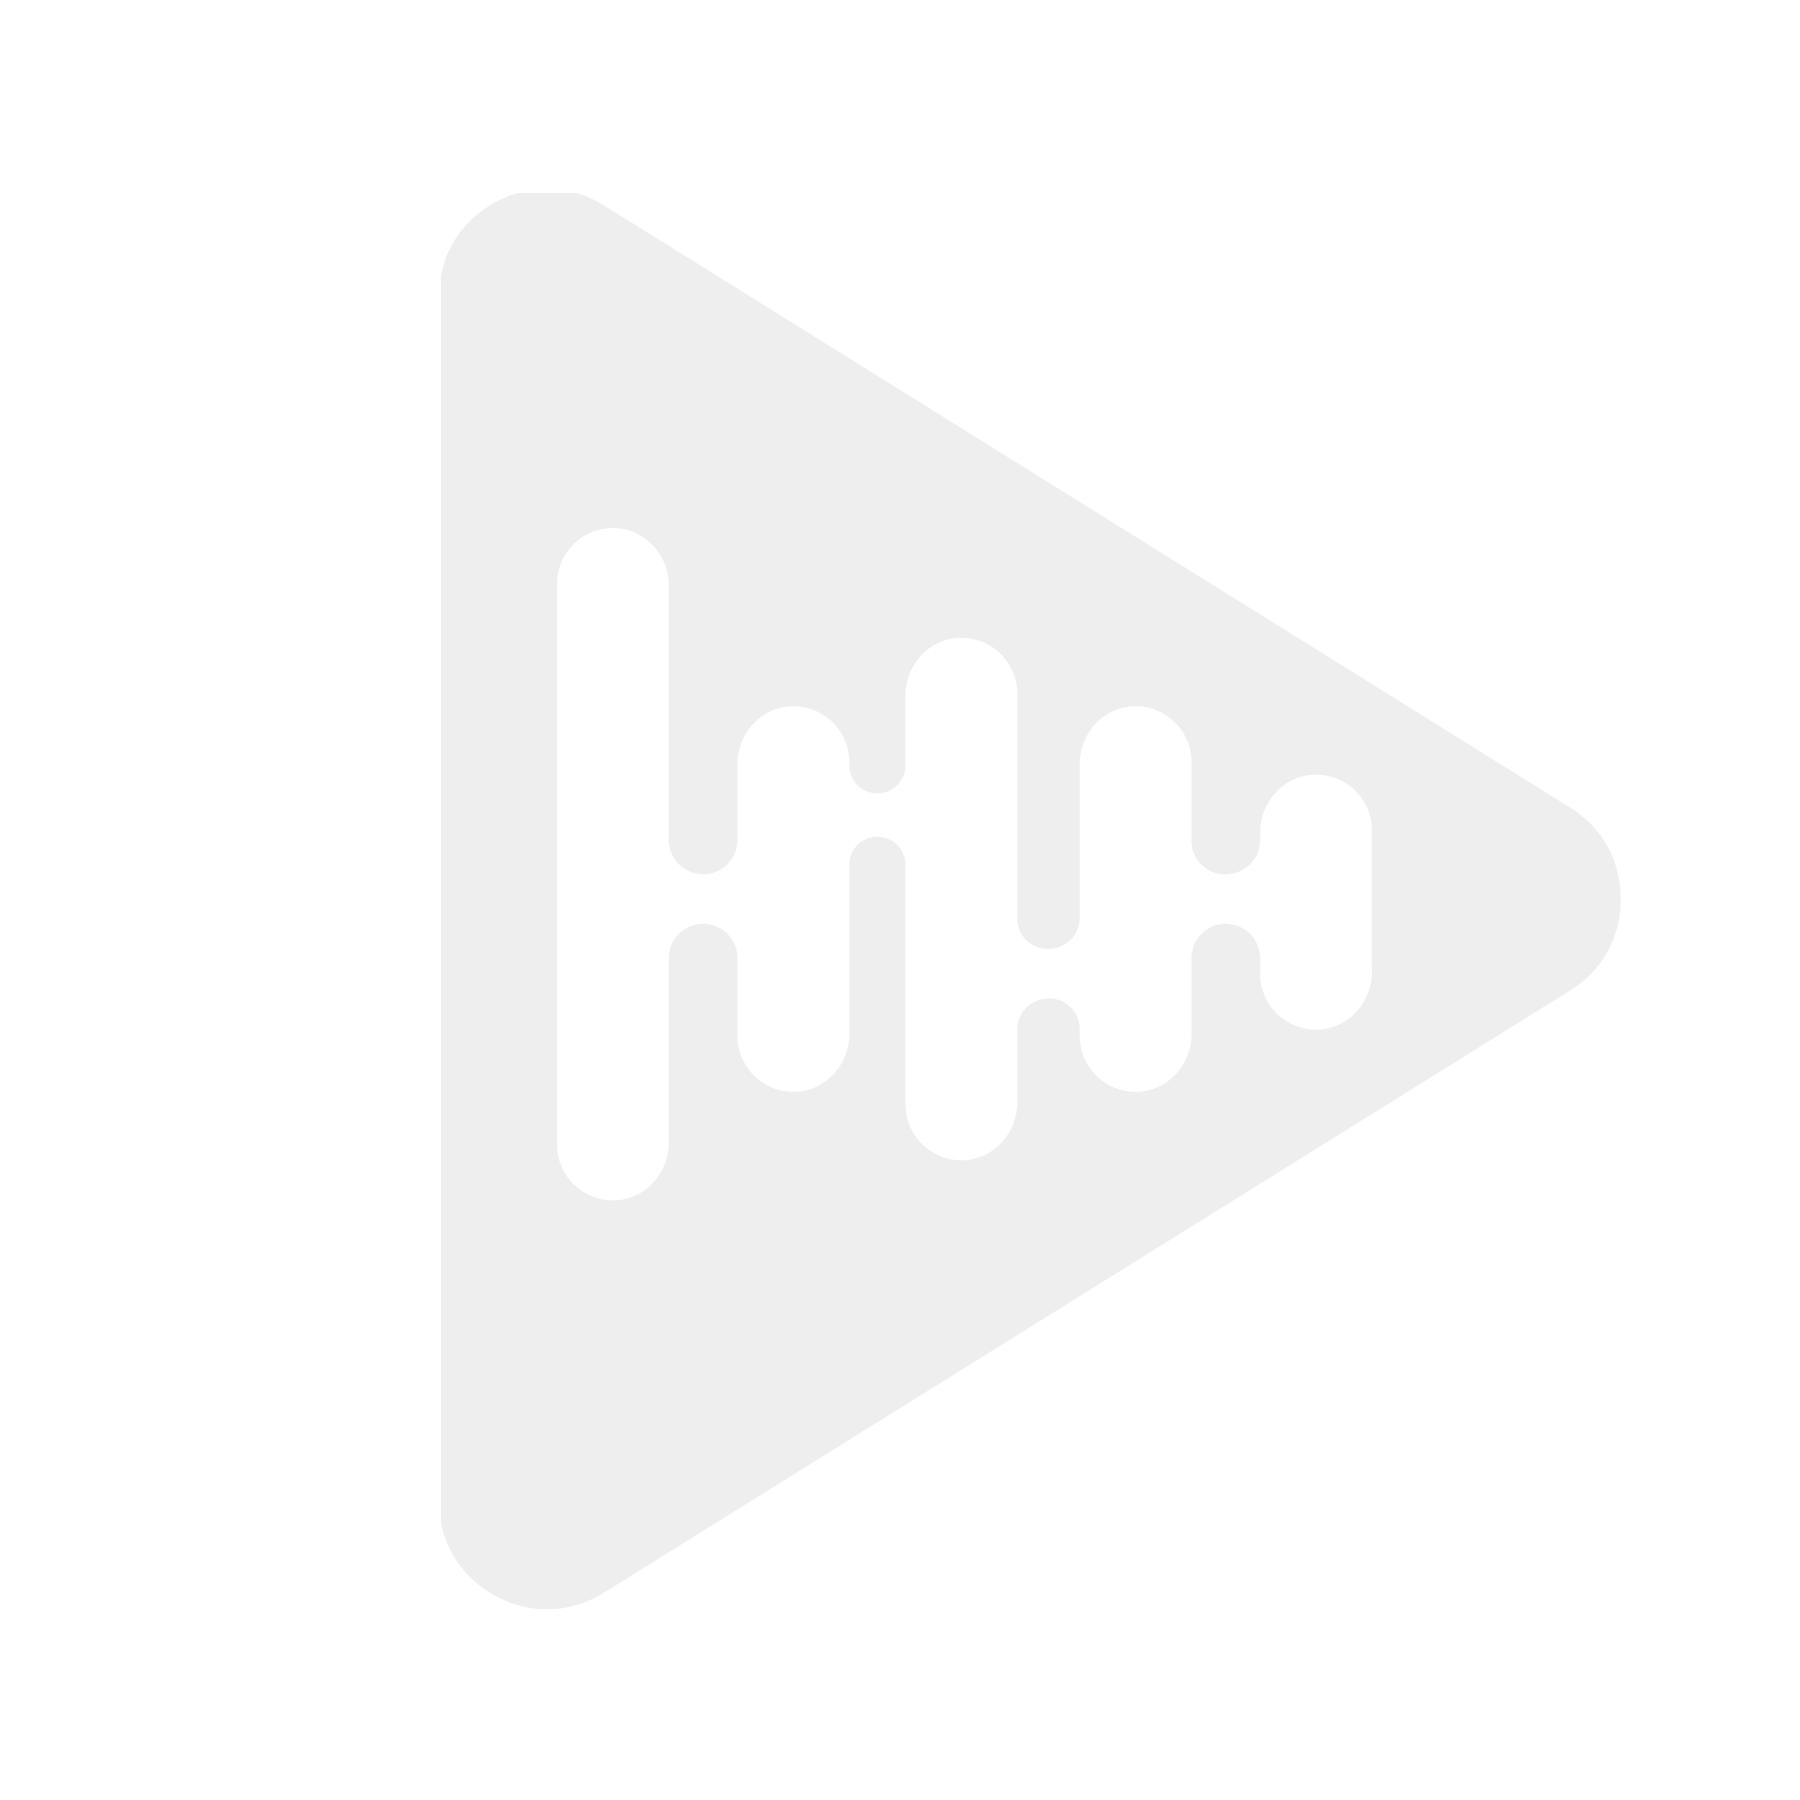 Incartec 40-0183-165